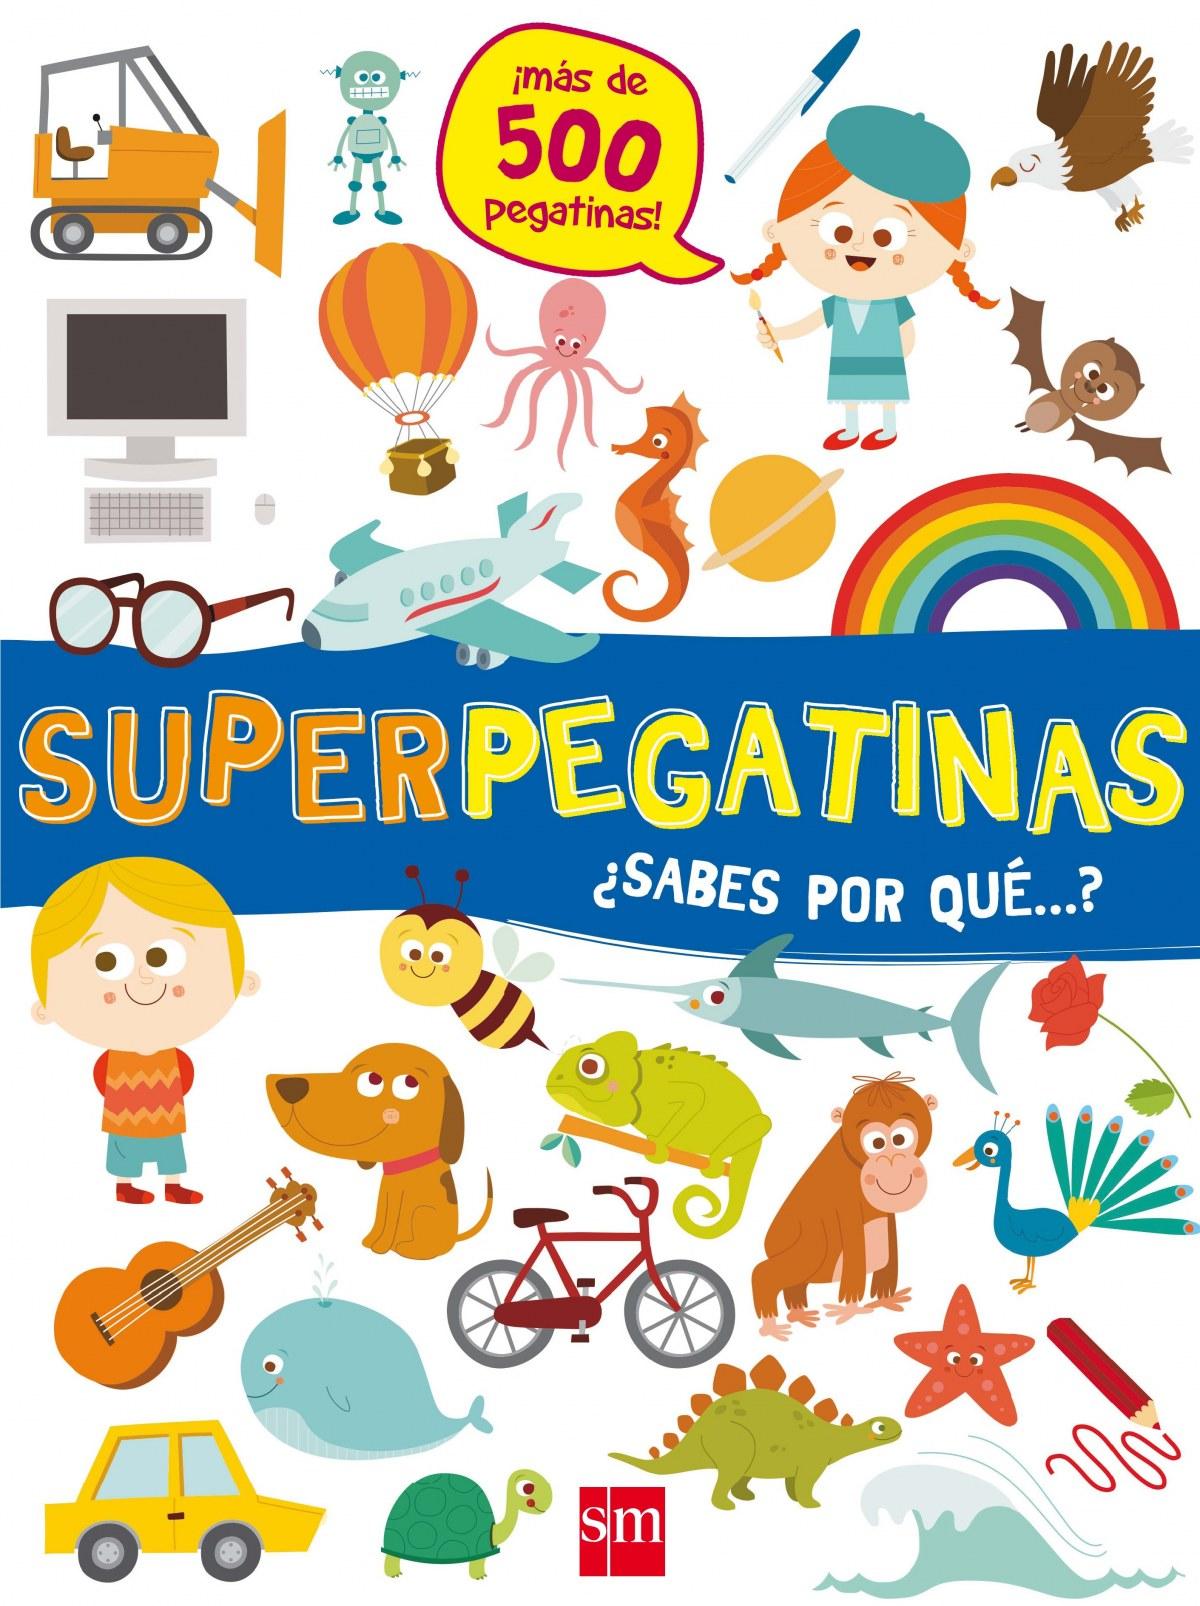 SUPERPEGATINAS ¿SABES POR QUE?